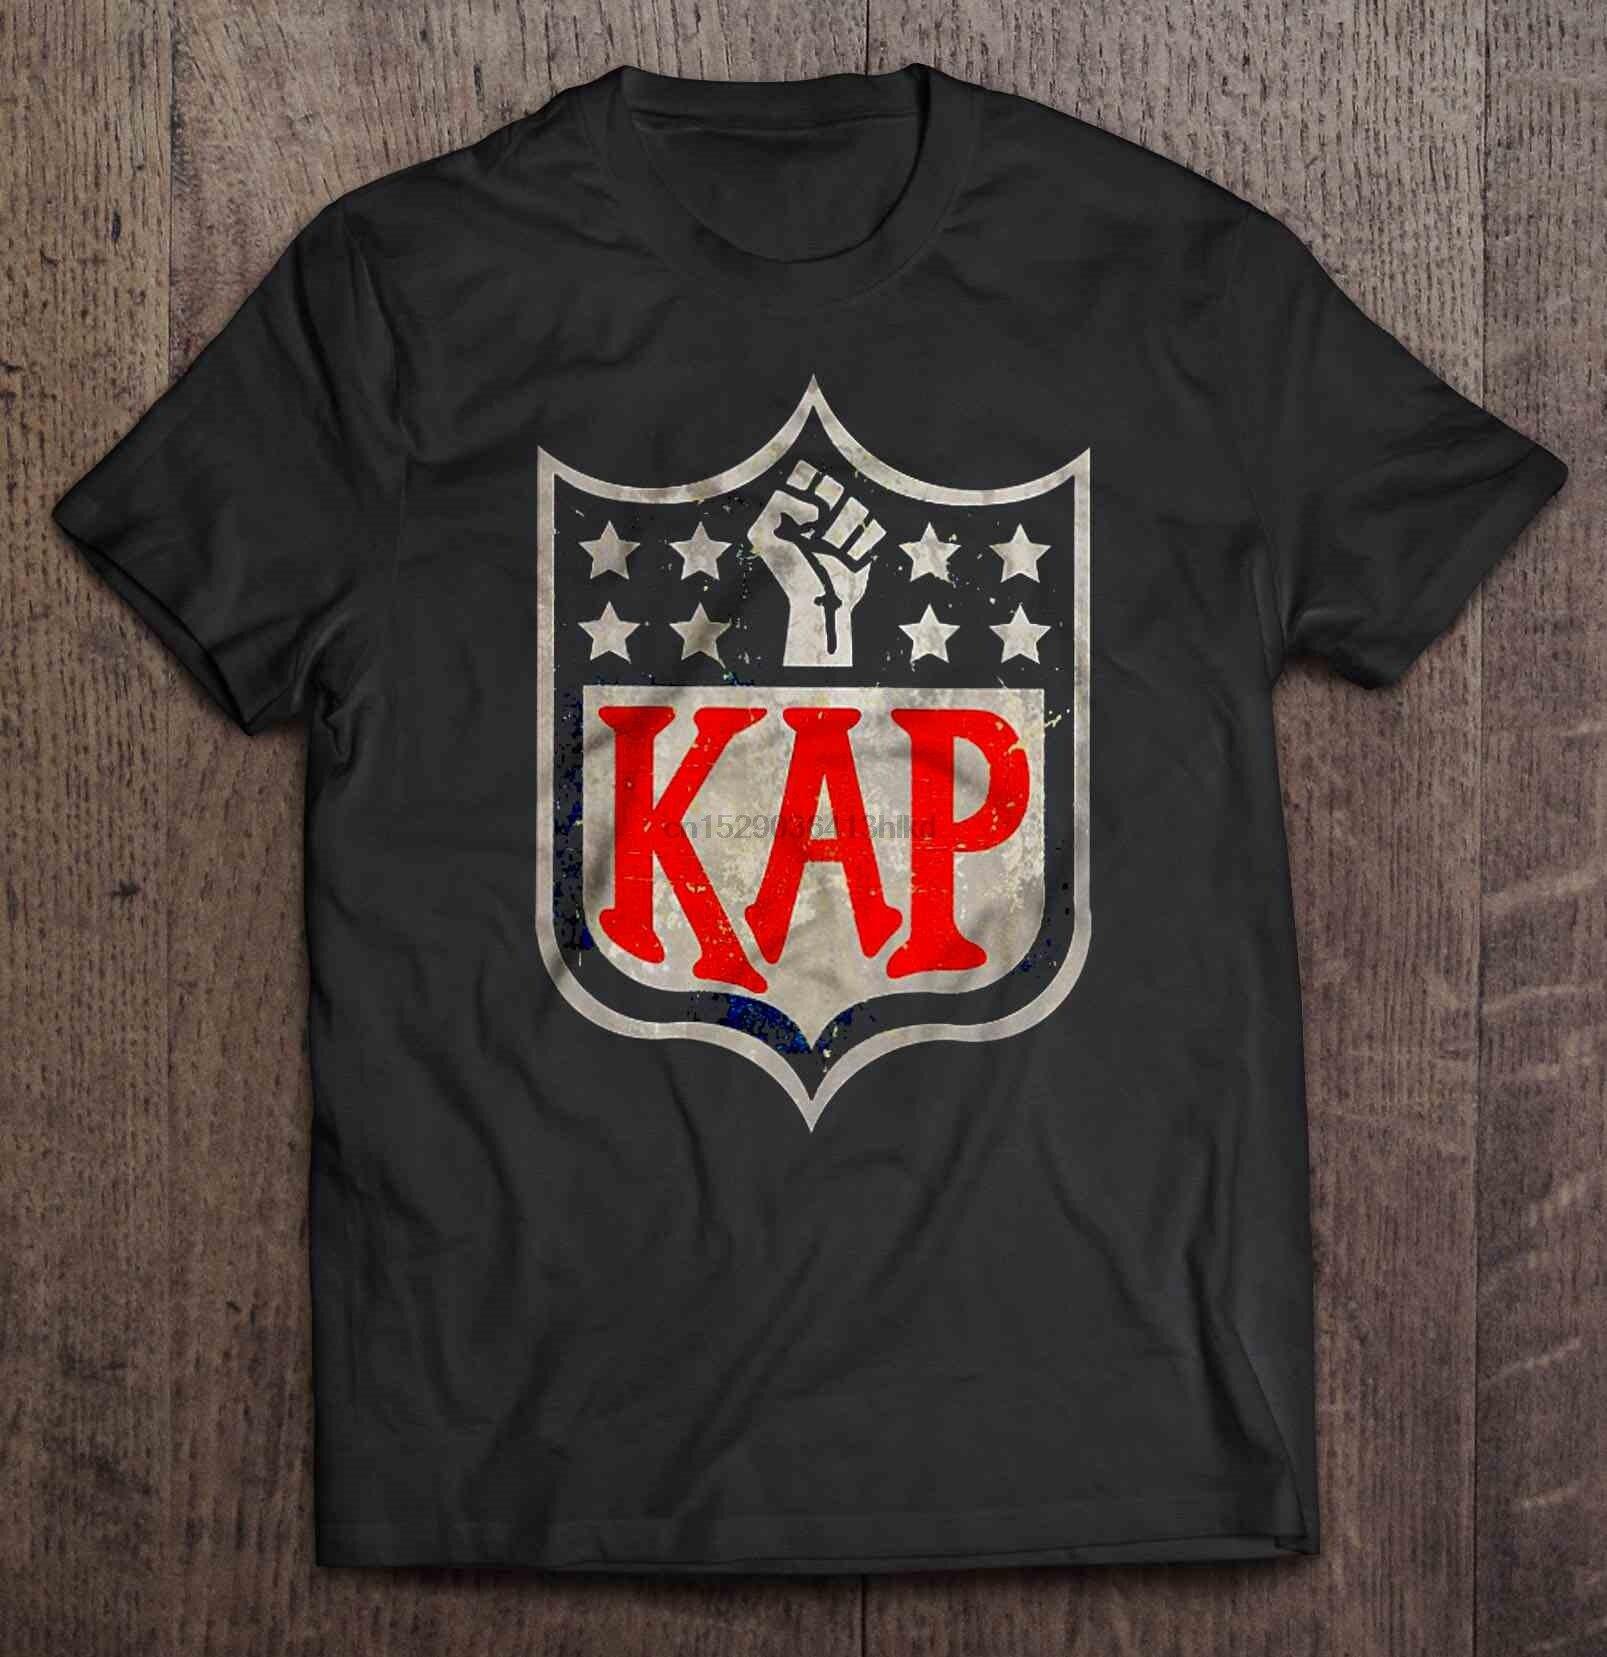 Camiseta para hombre, camiseta Kap resistent, camiseta de mujer de la versión Kaepernick